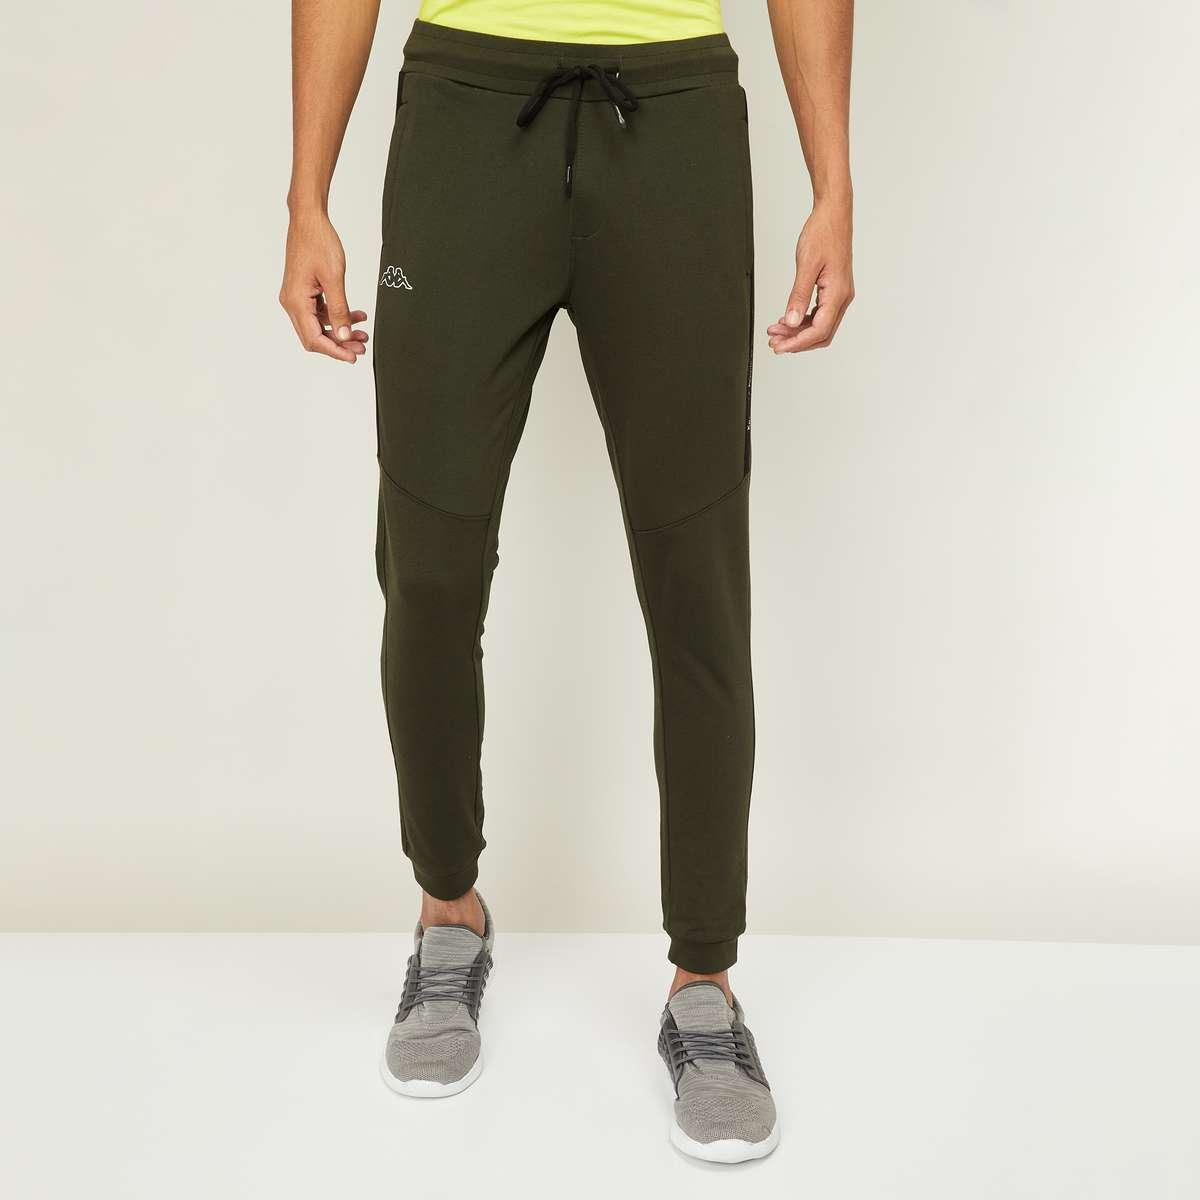 4.KAPPA Men Solid Slim Fit Elasticated Joggers